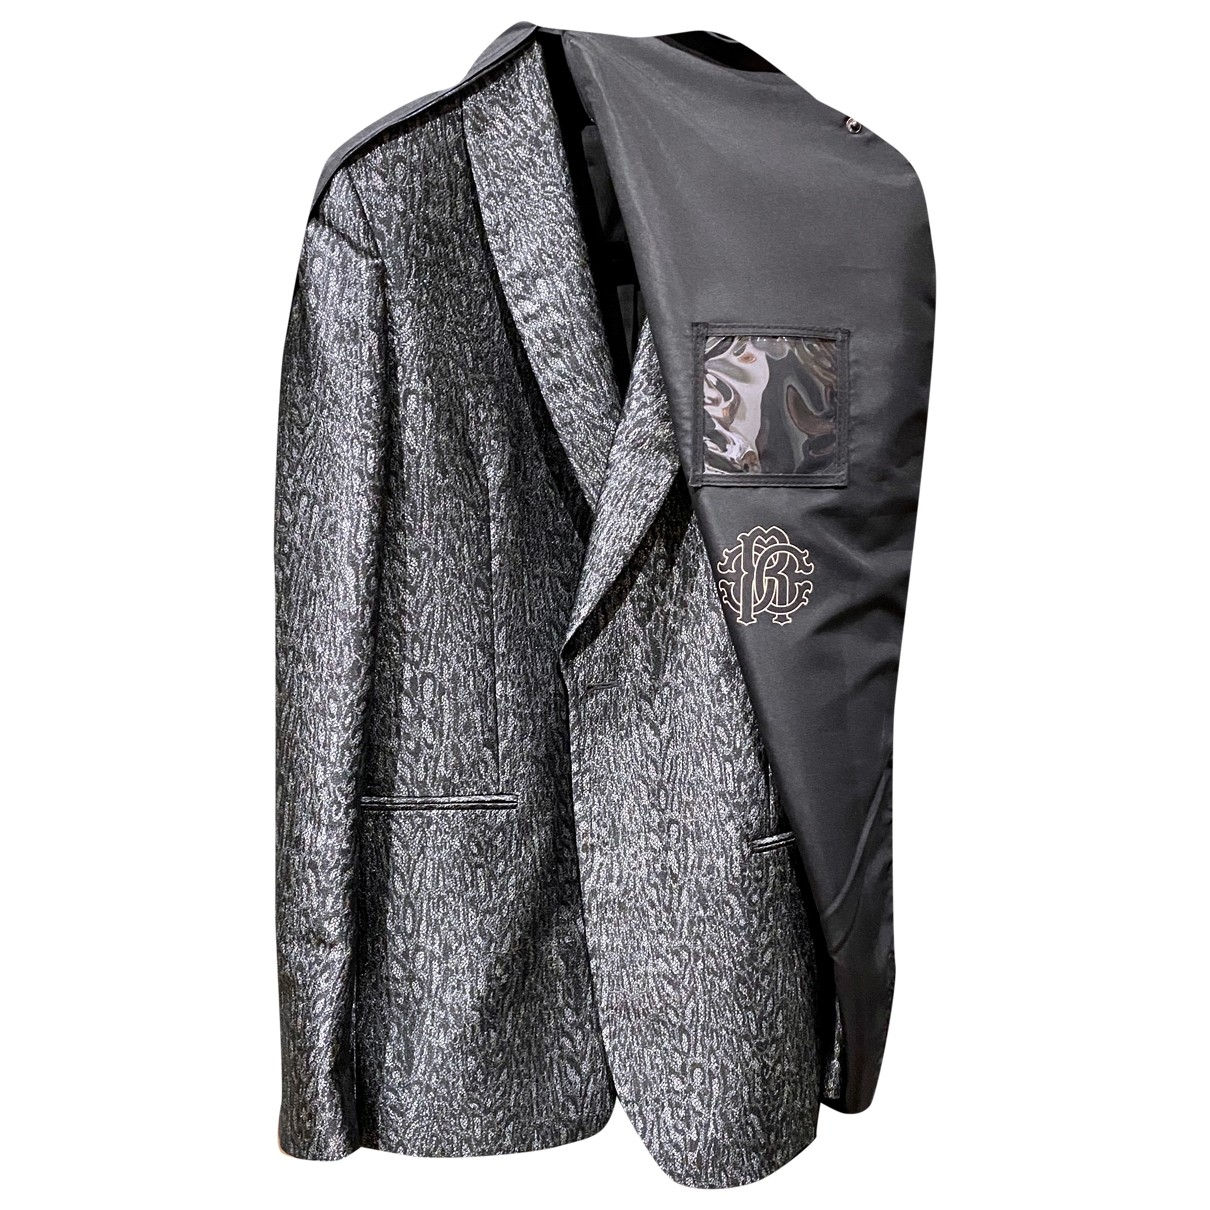 Roberto Cavalli \N Black jacket  for Men 56 IT